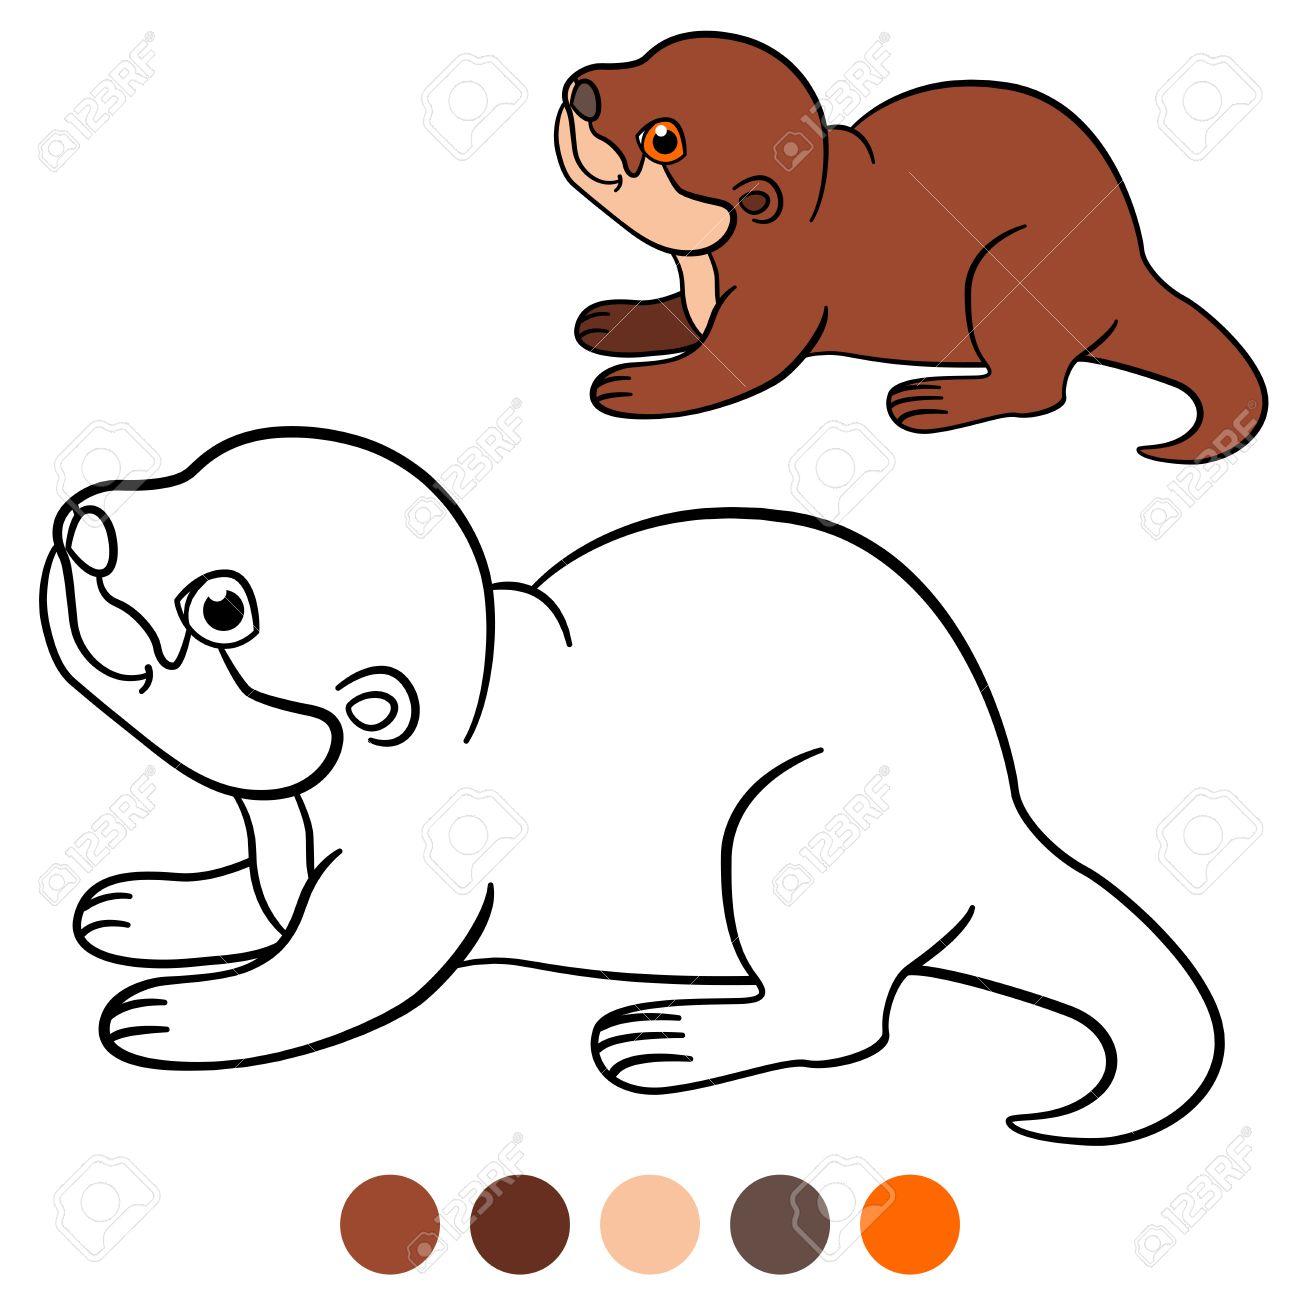 Asombroso Lindo Bebé Para Colorear Patrón - Dibujos Para Colorear En ...